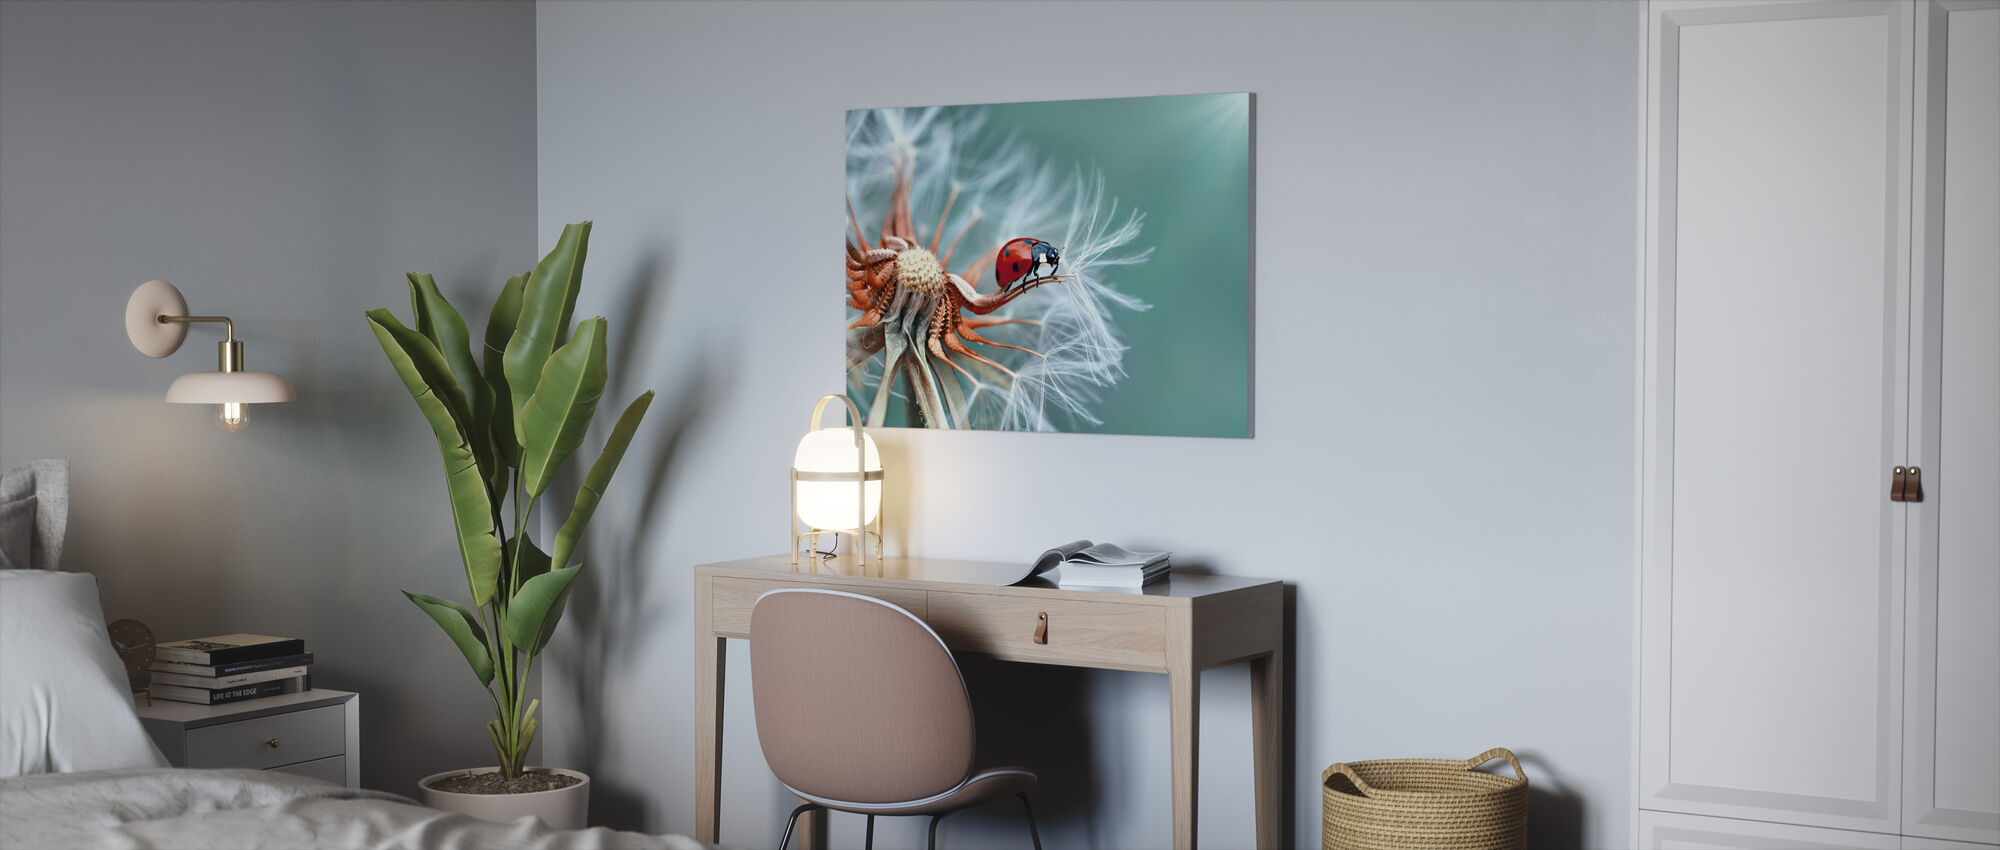 Freedoom - Canvas print - Kantoor